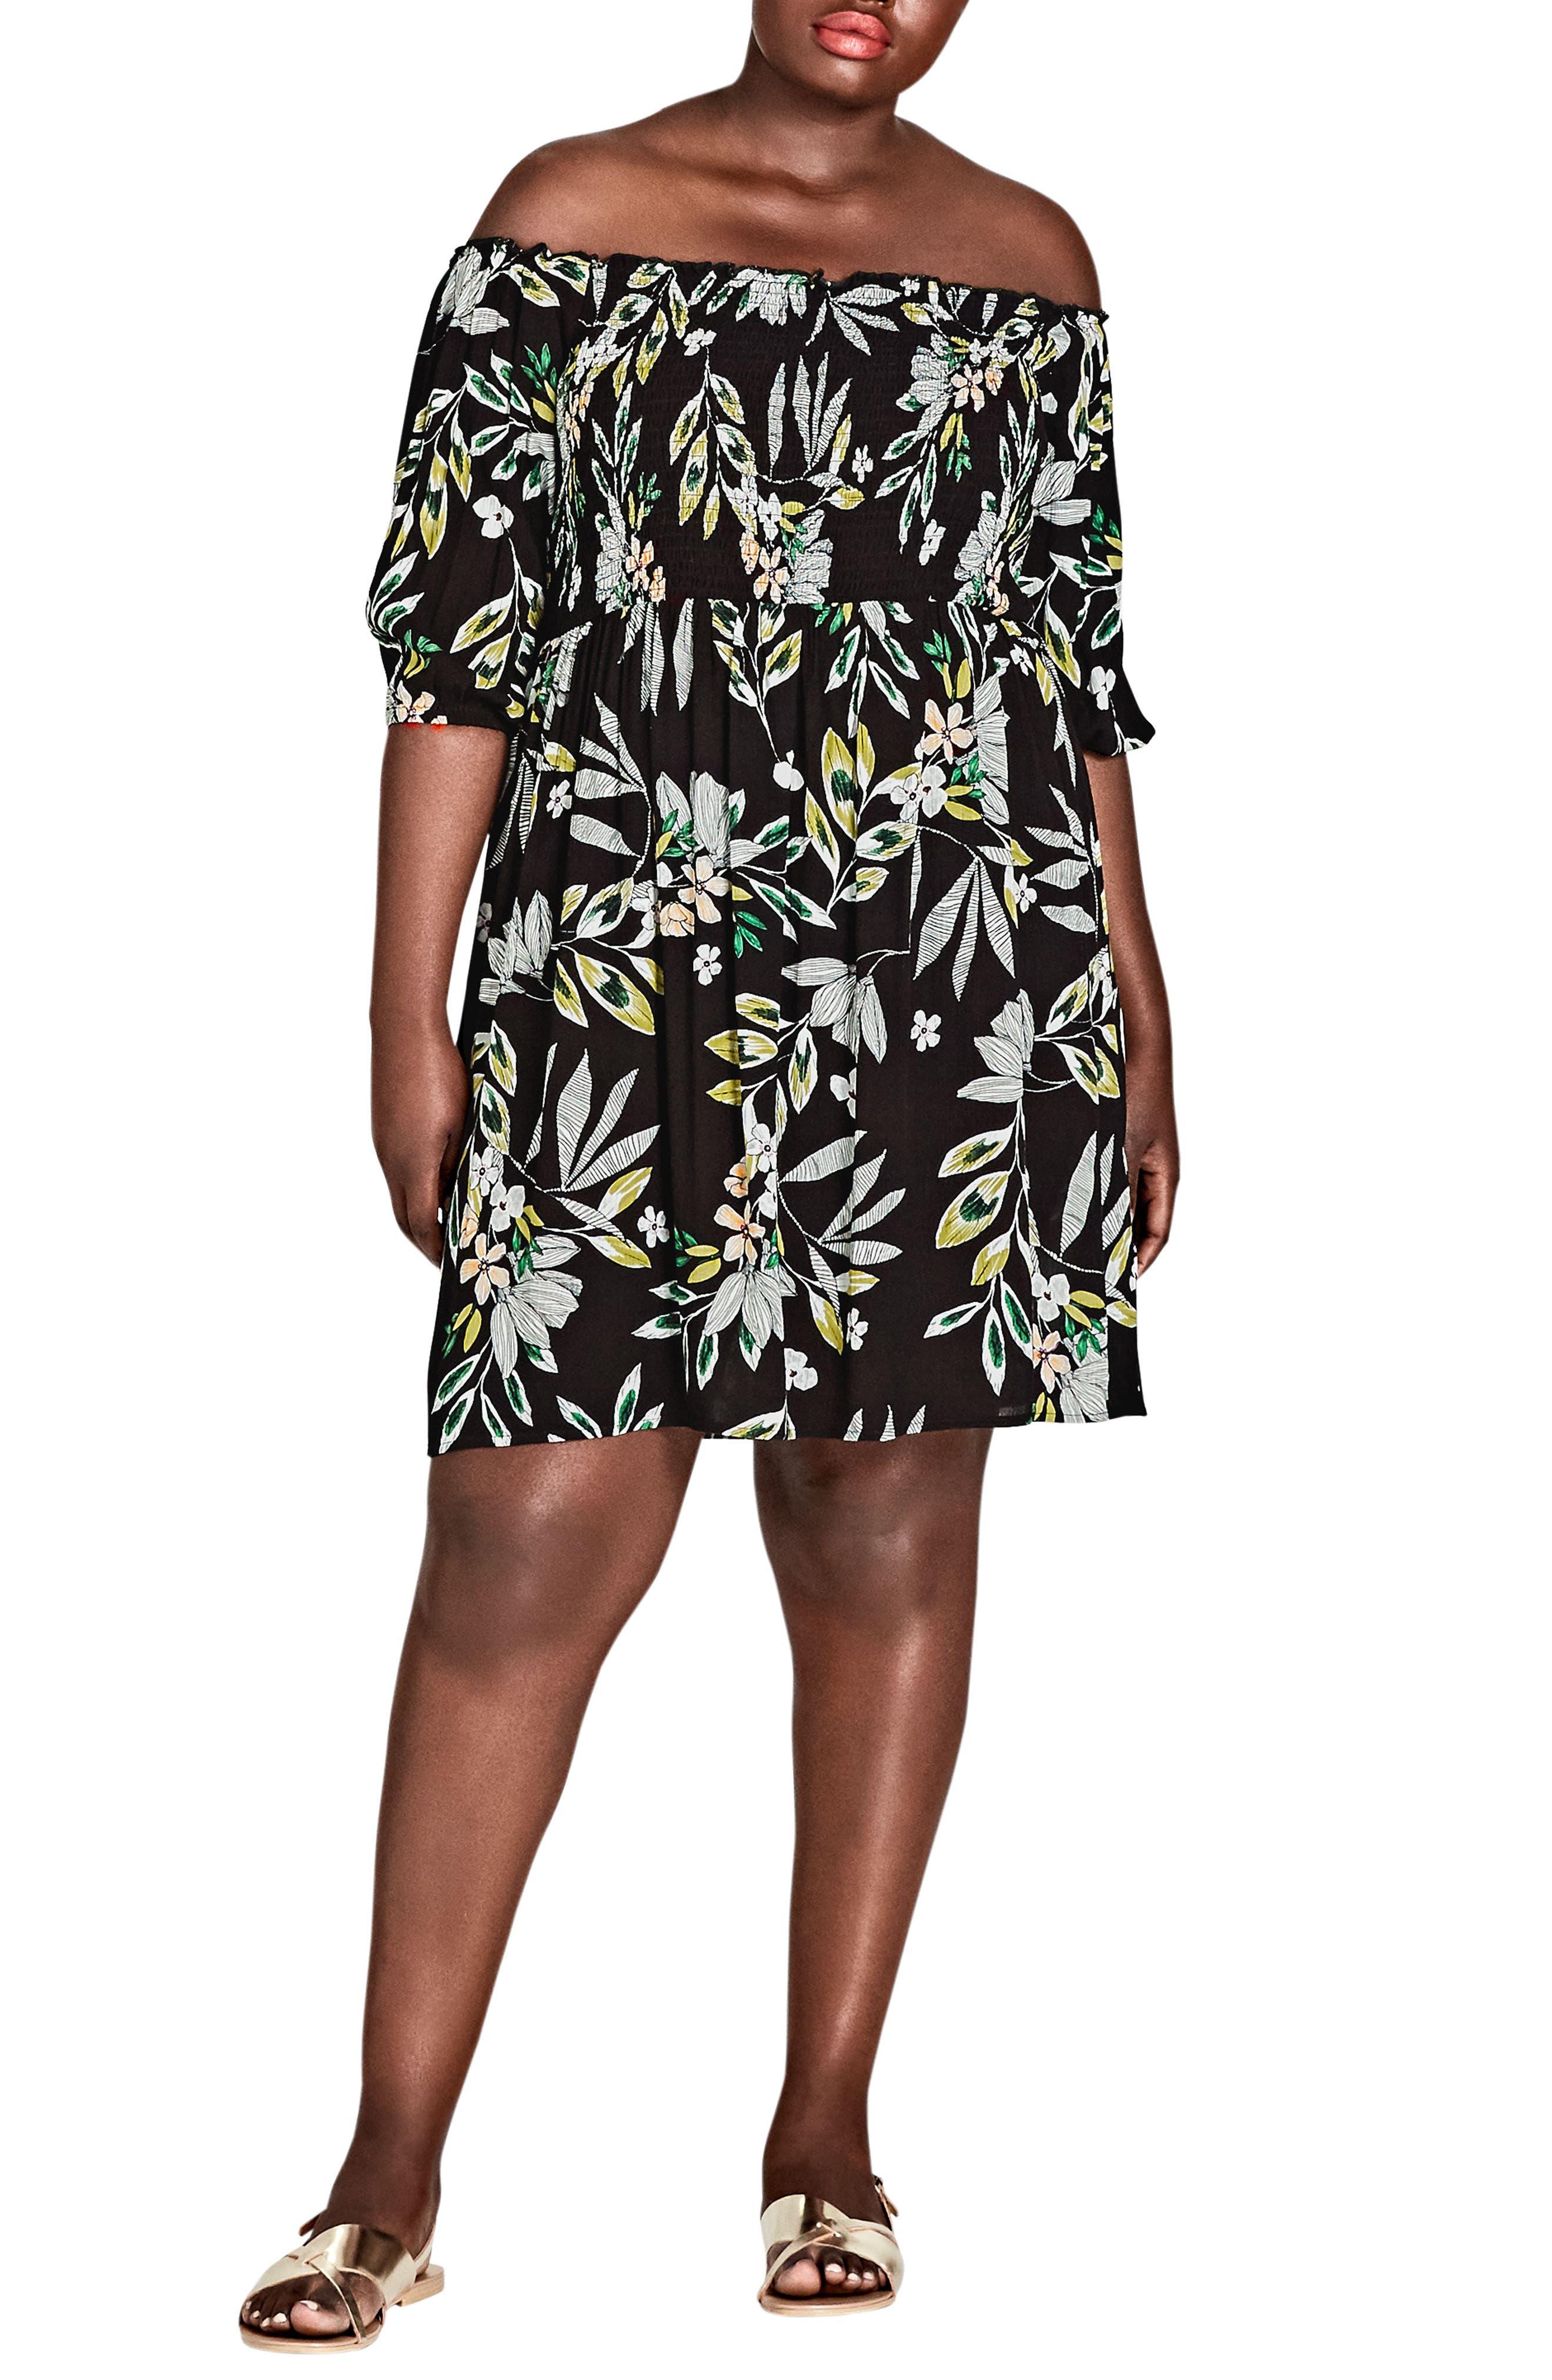 Maui Floral Off the Shoulder Dress,                         Main,                         color, MAUI FLORAL